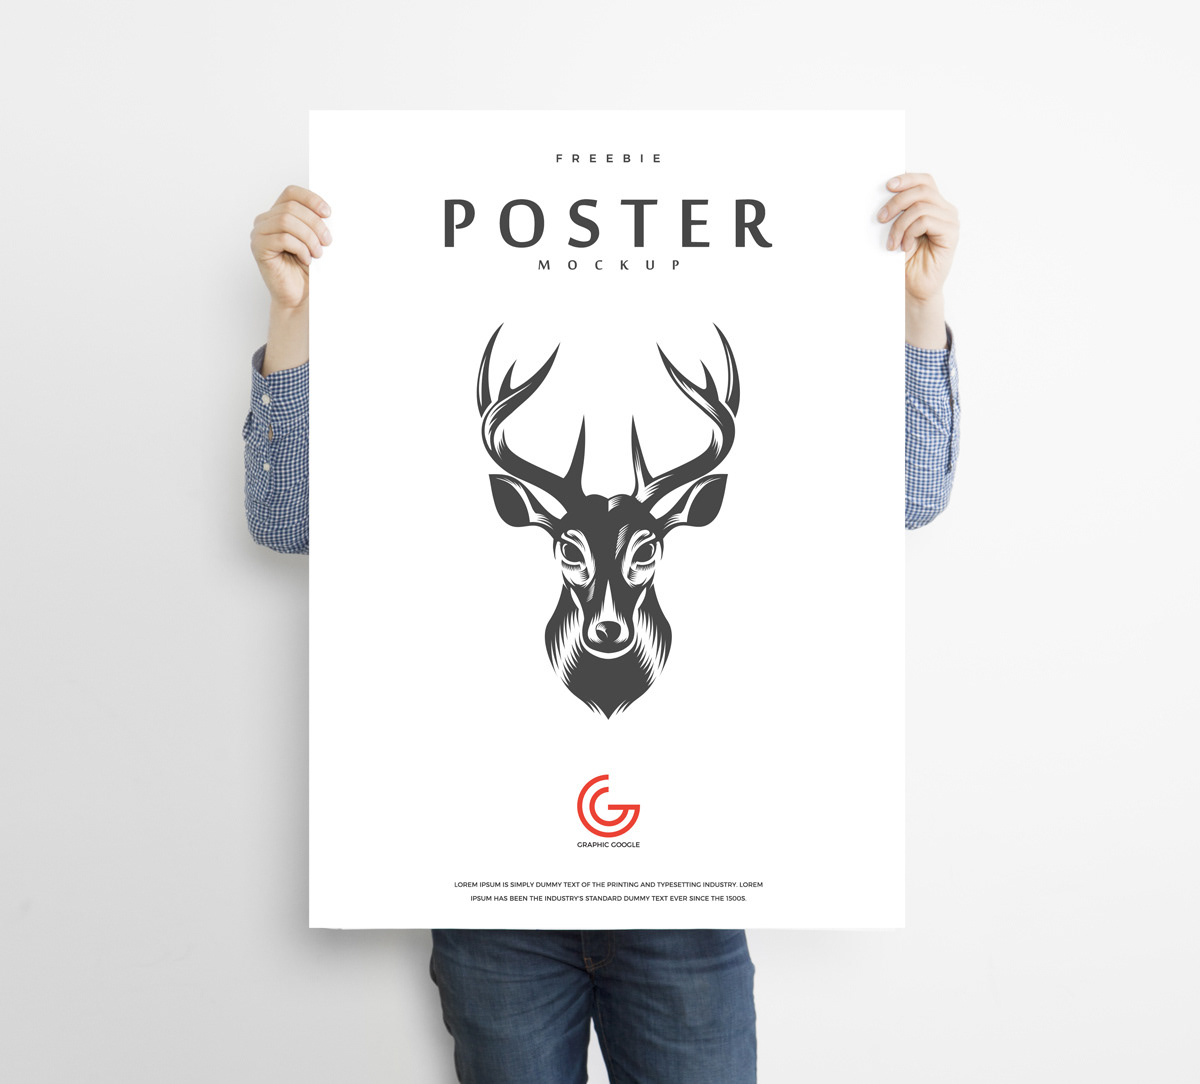 poster Poster Mockup Mockup free mockup  mockup free mockup psd psd free freebie branding